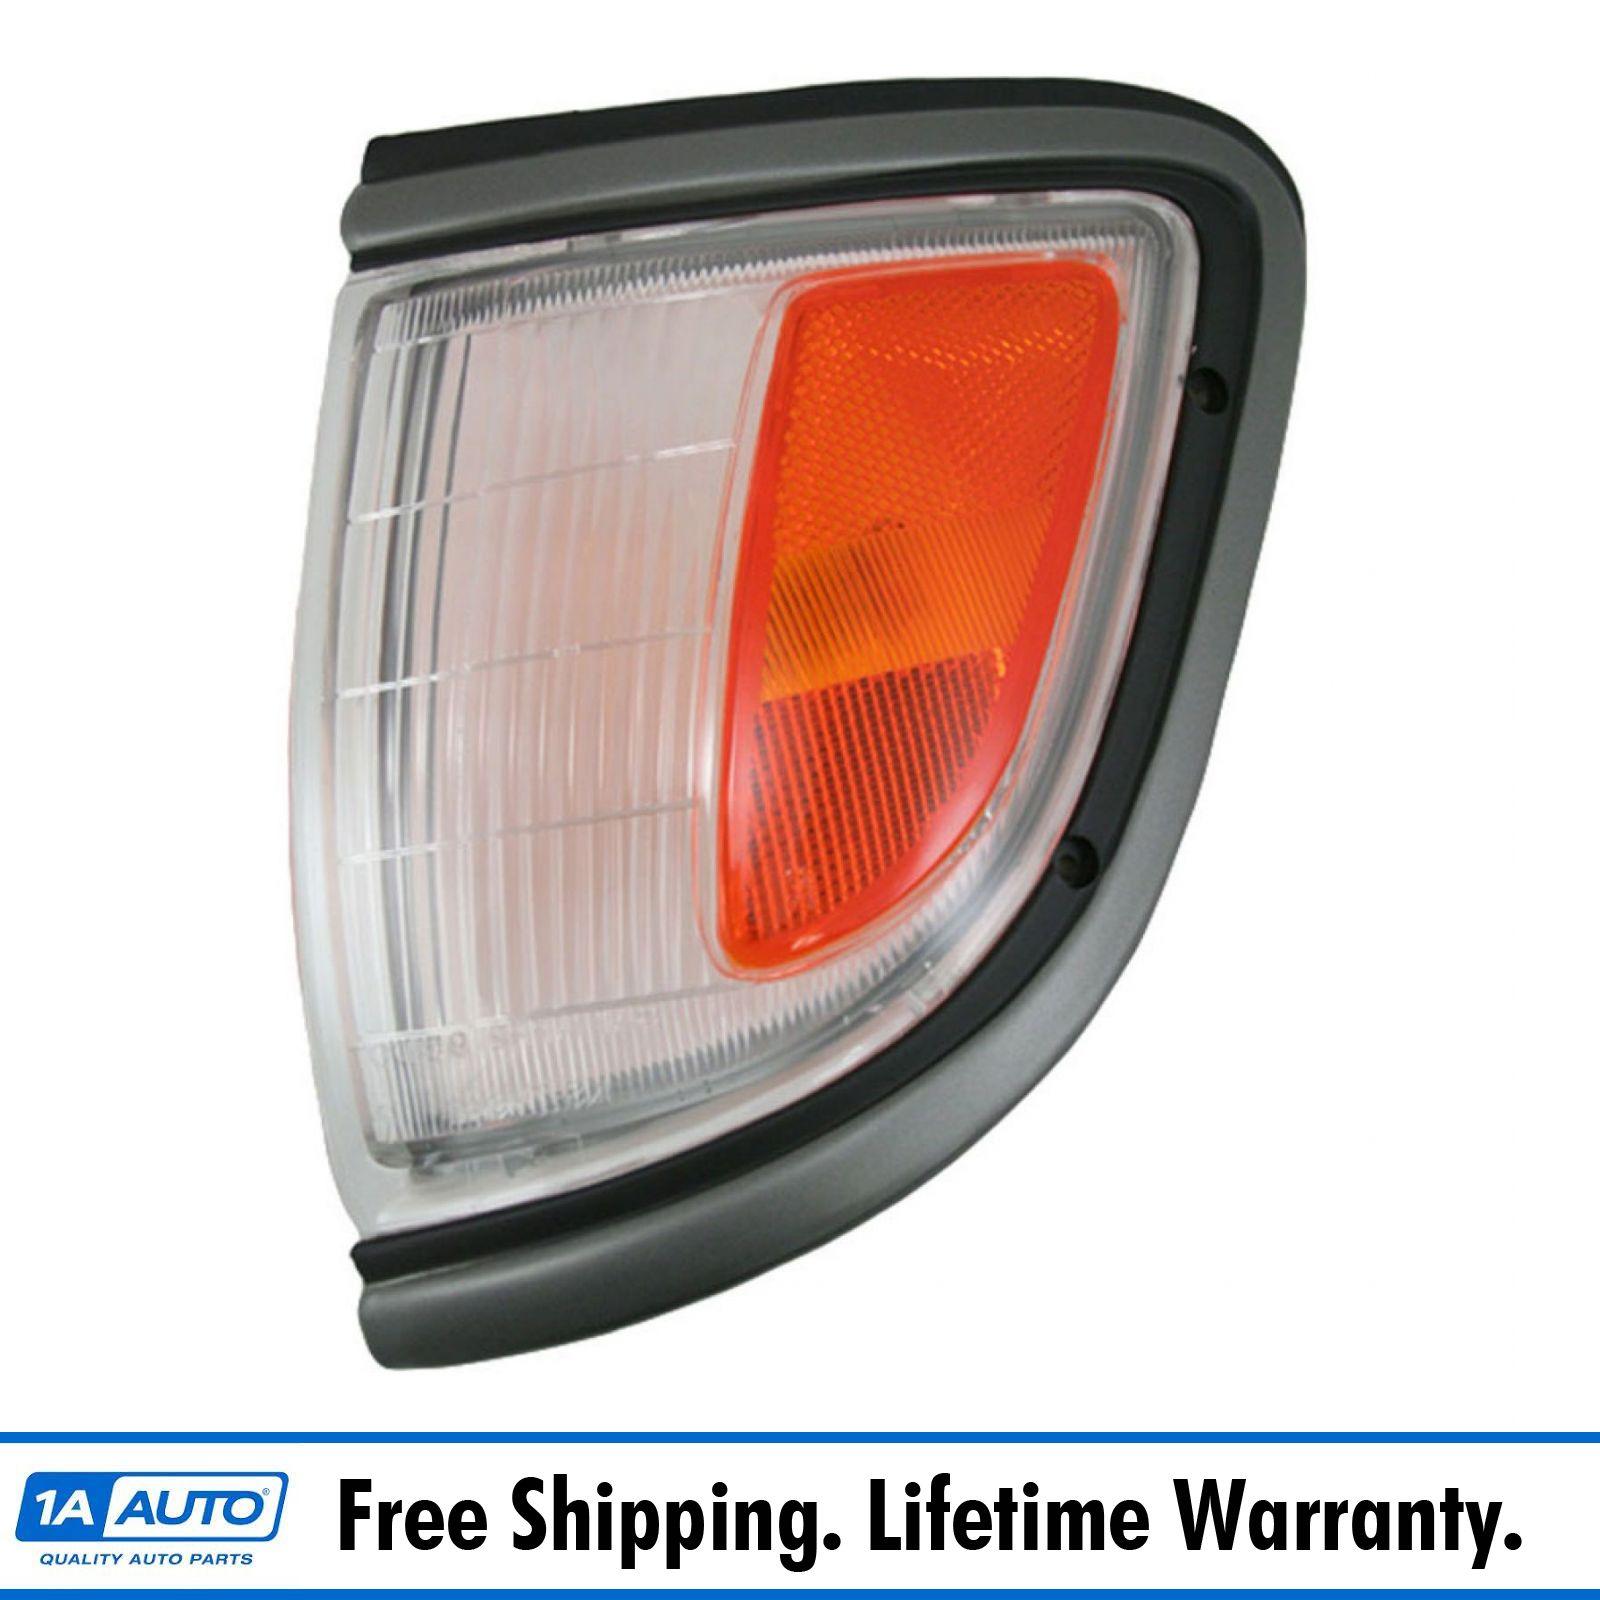 For 95-96 Tacoma 2WD Park Corner Light Turn Signal Marker Lamp Left Driver LH